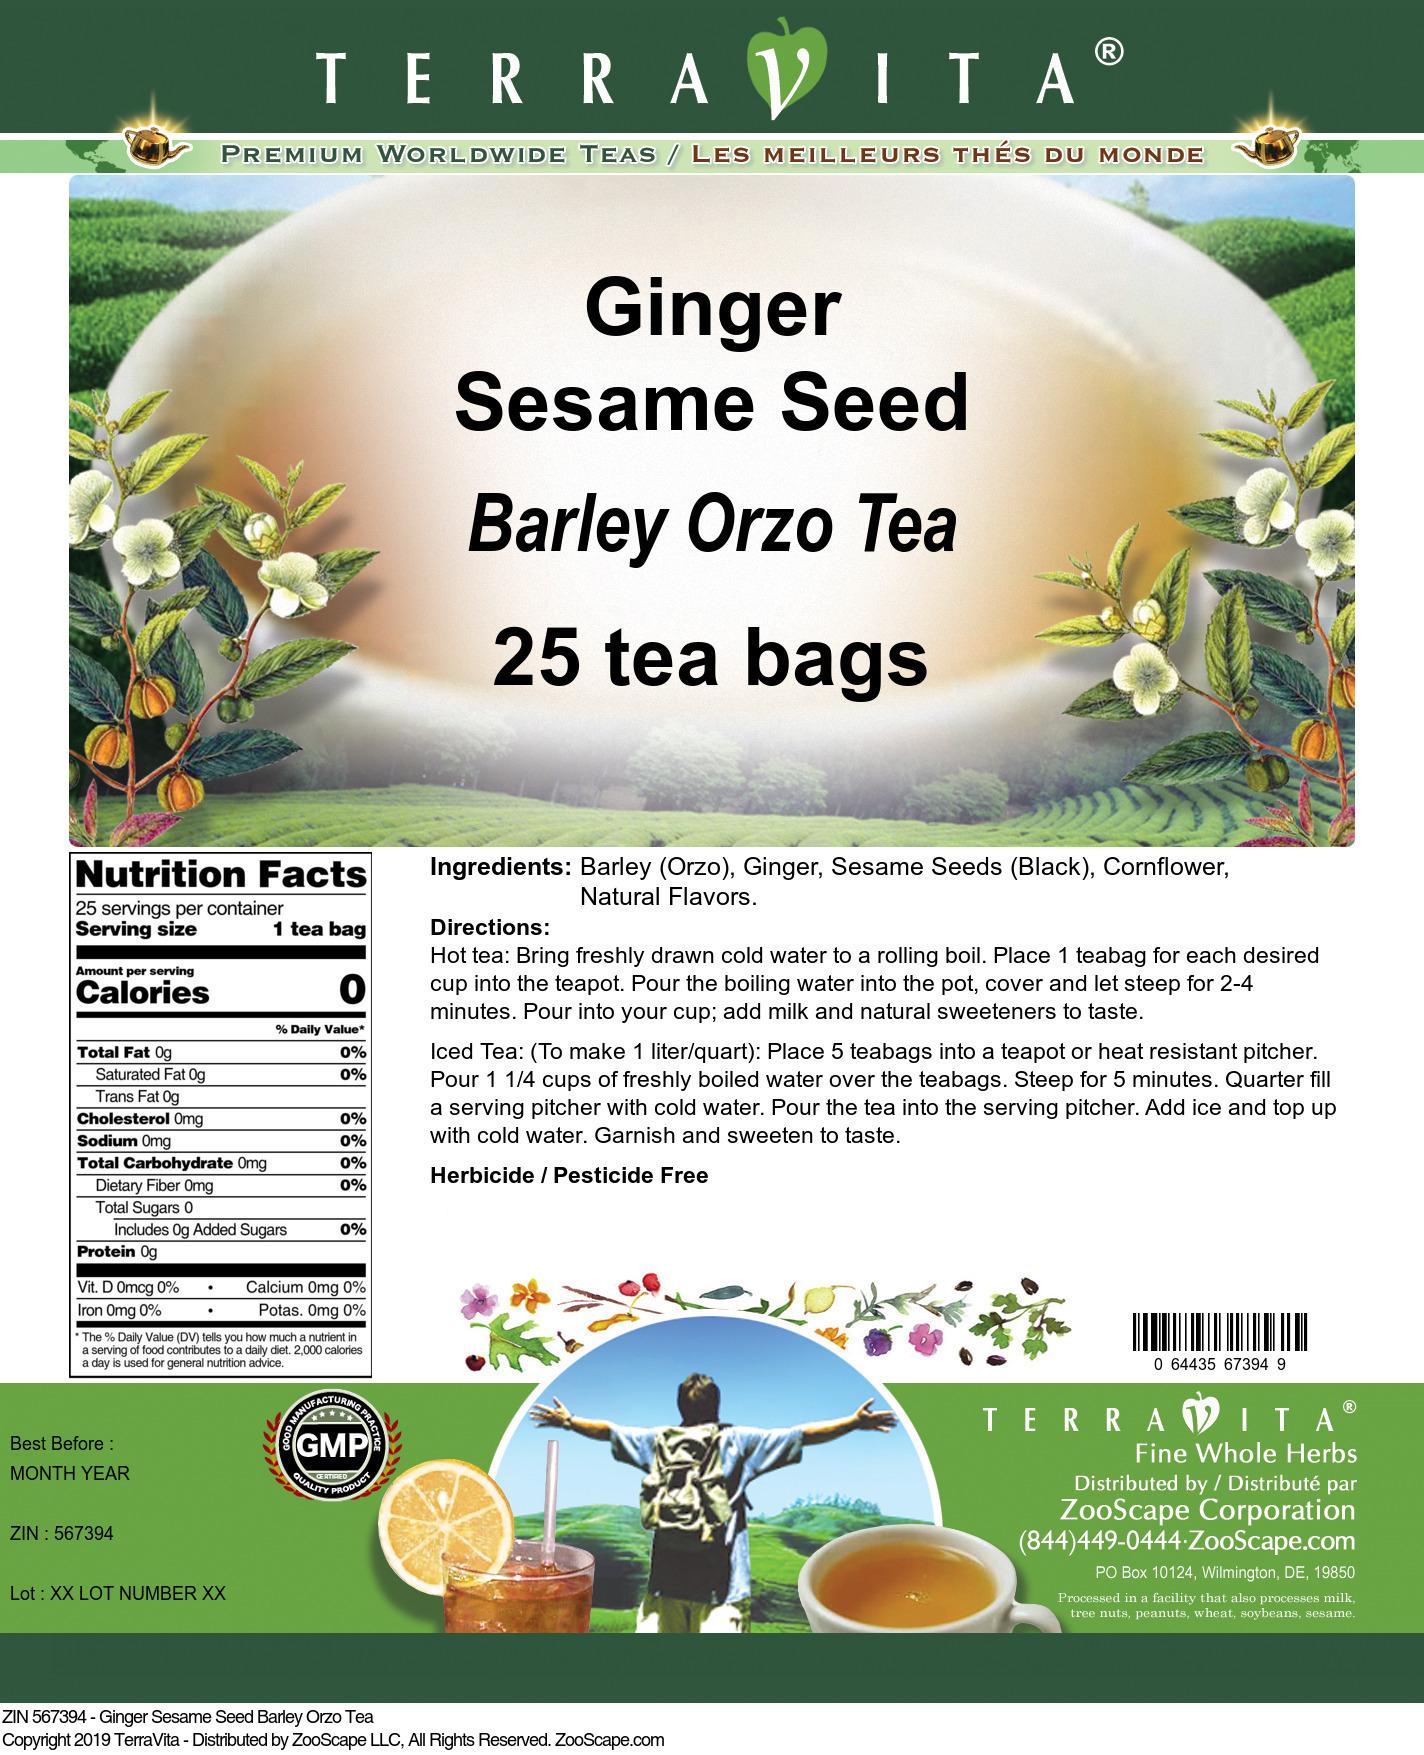 Ginger Sesame Seed Barley Orzo Tea